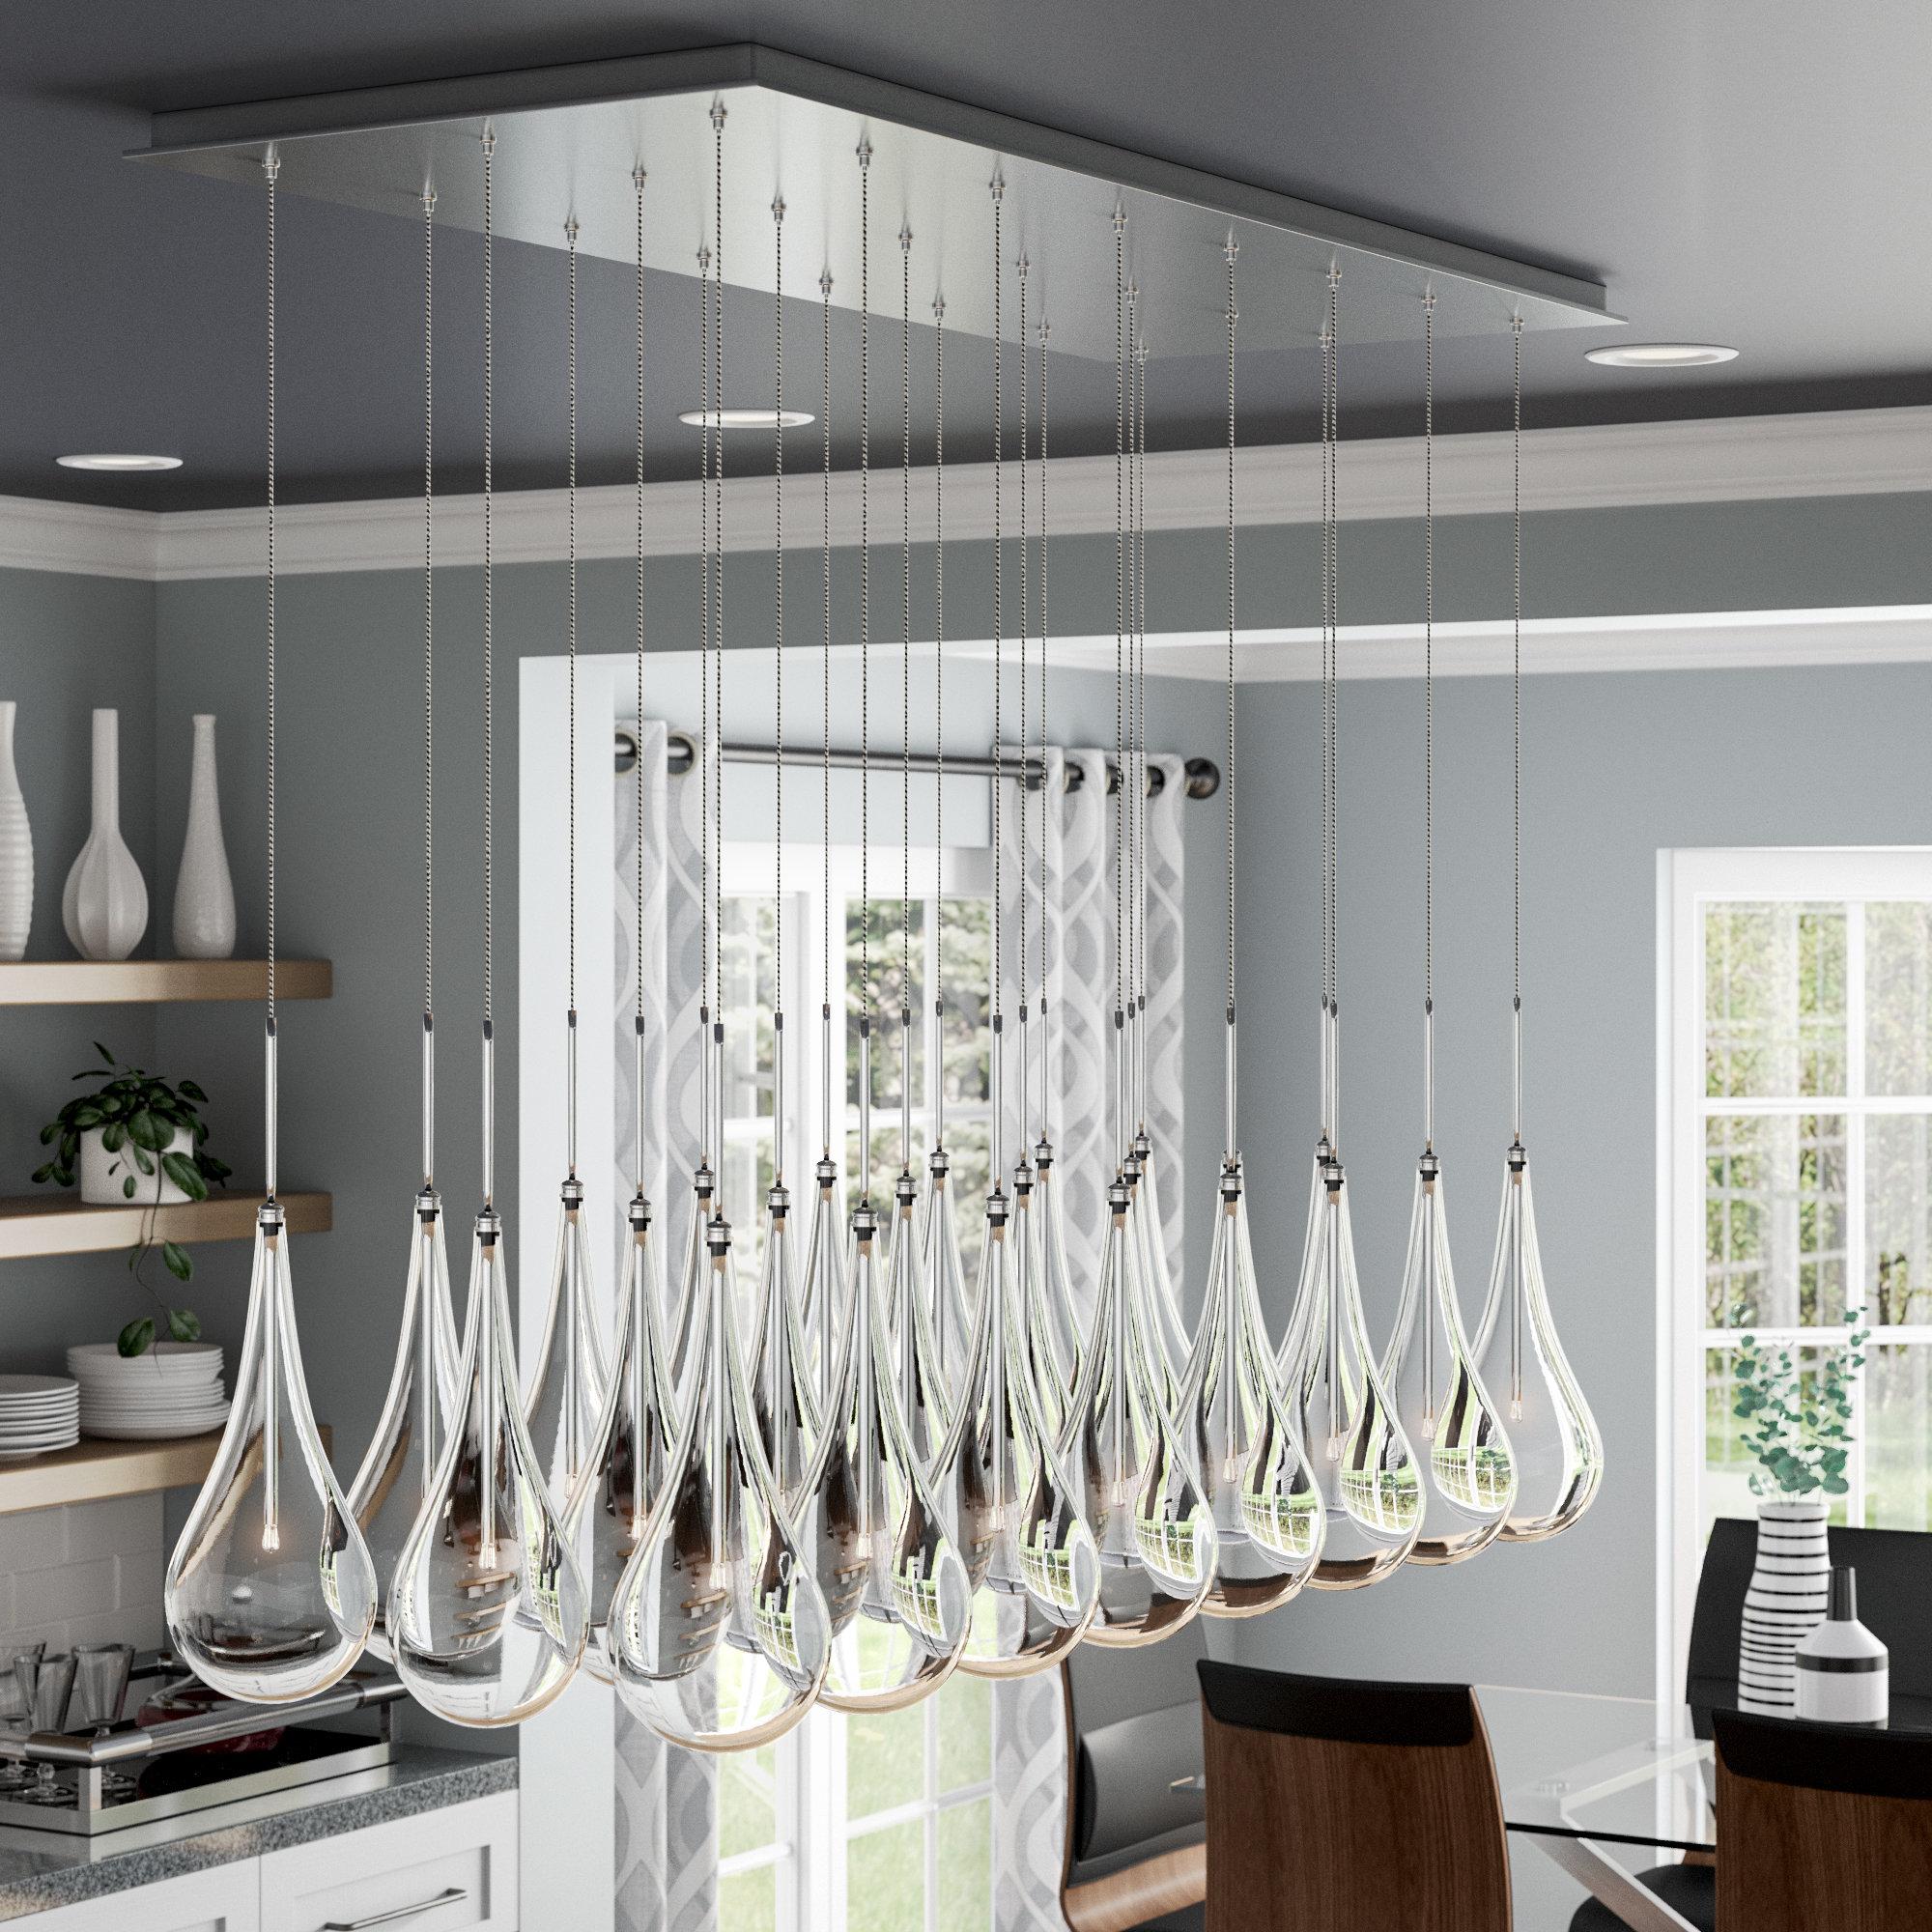 Fashionable Neal 5 Light Kitchen Island Teardrop Pendants With Regard To Neal Led Kitchen Island Pendant (View 5 of 25)